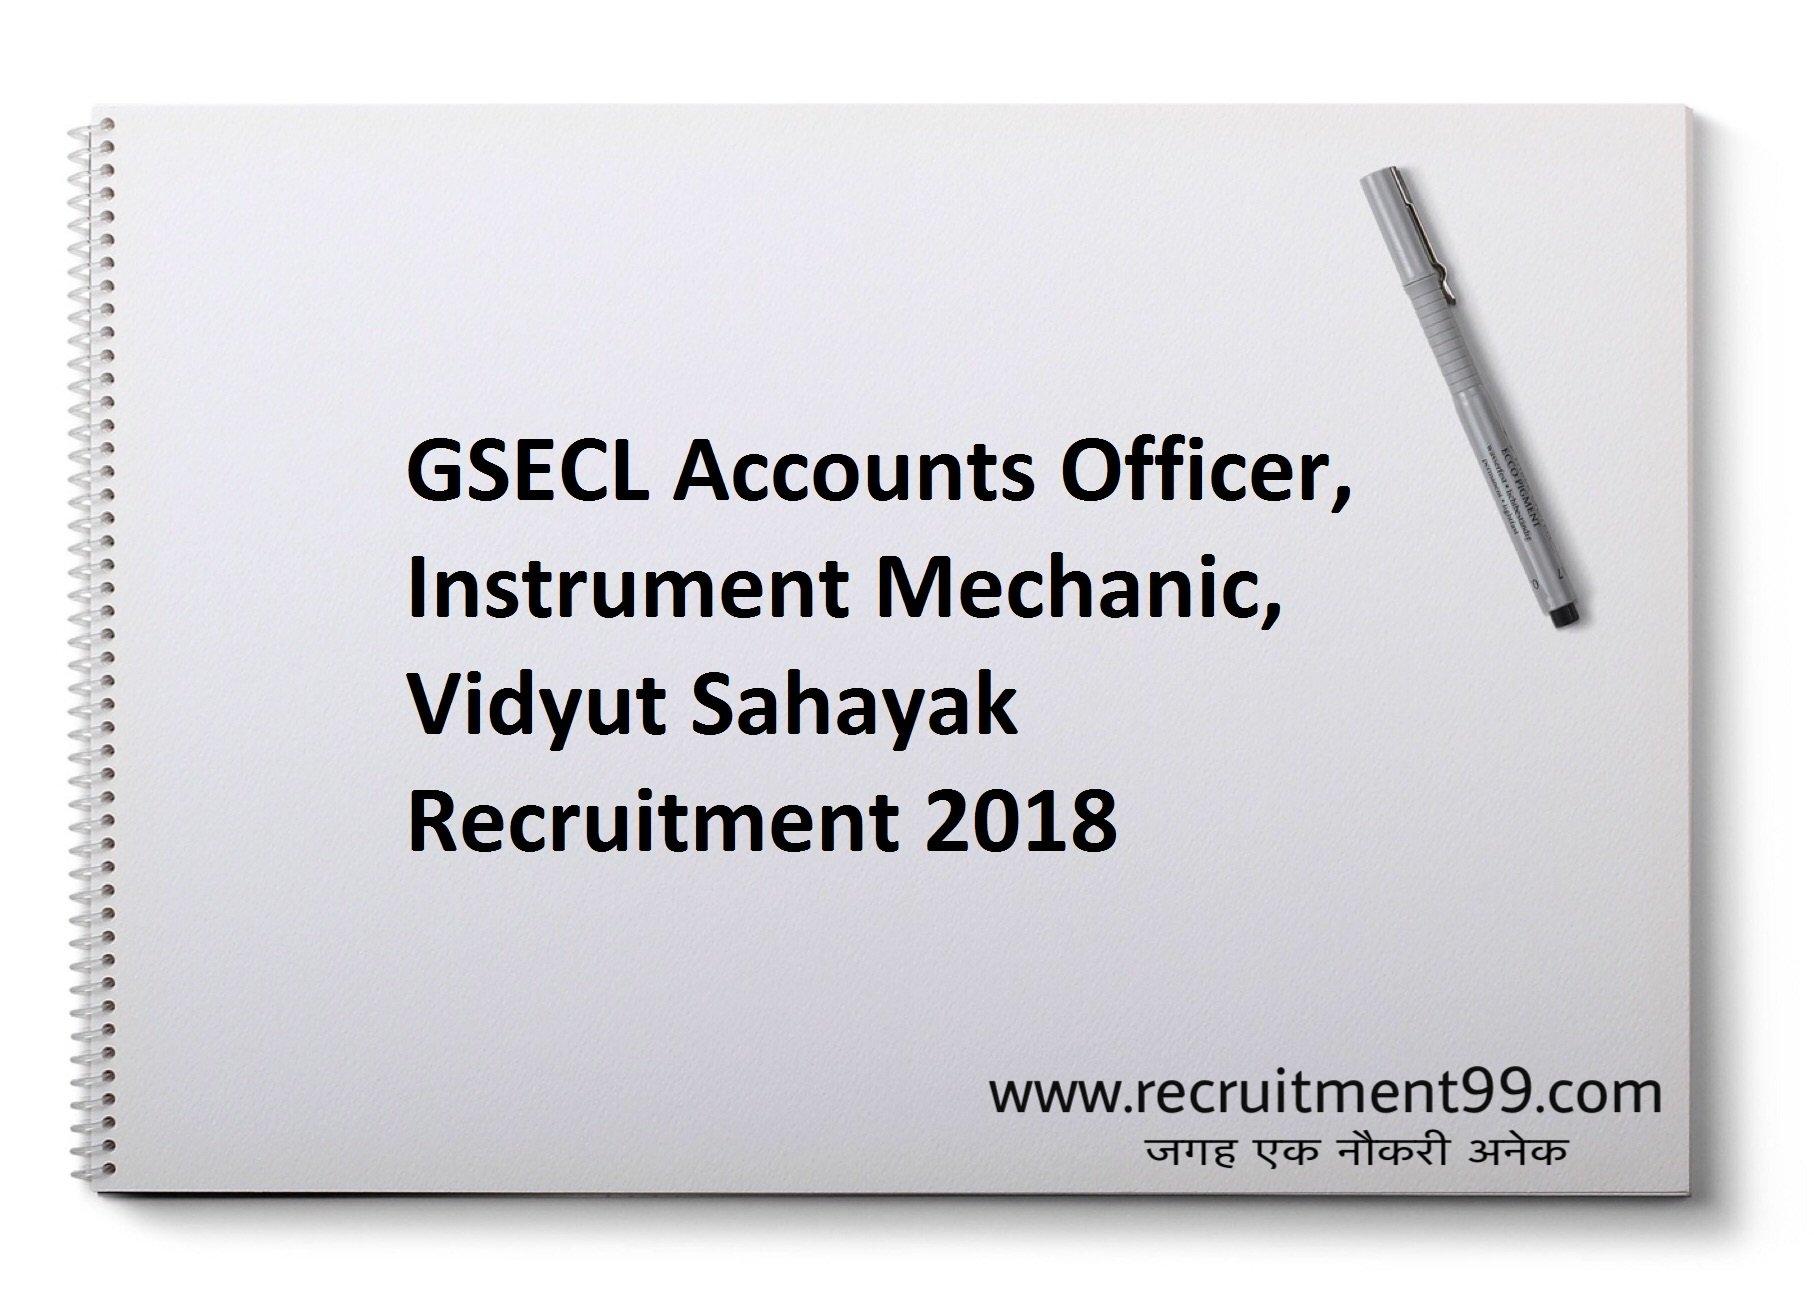 GSECL Accounts Officer Instrument Mechanic Vidyut Sahayak Recruitment Admit Card Result 2018